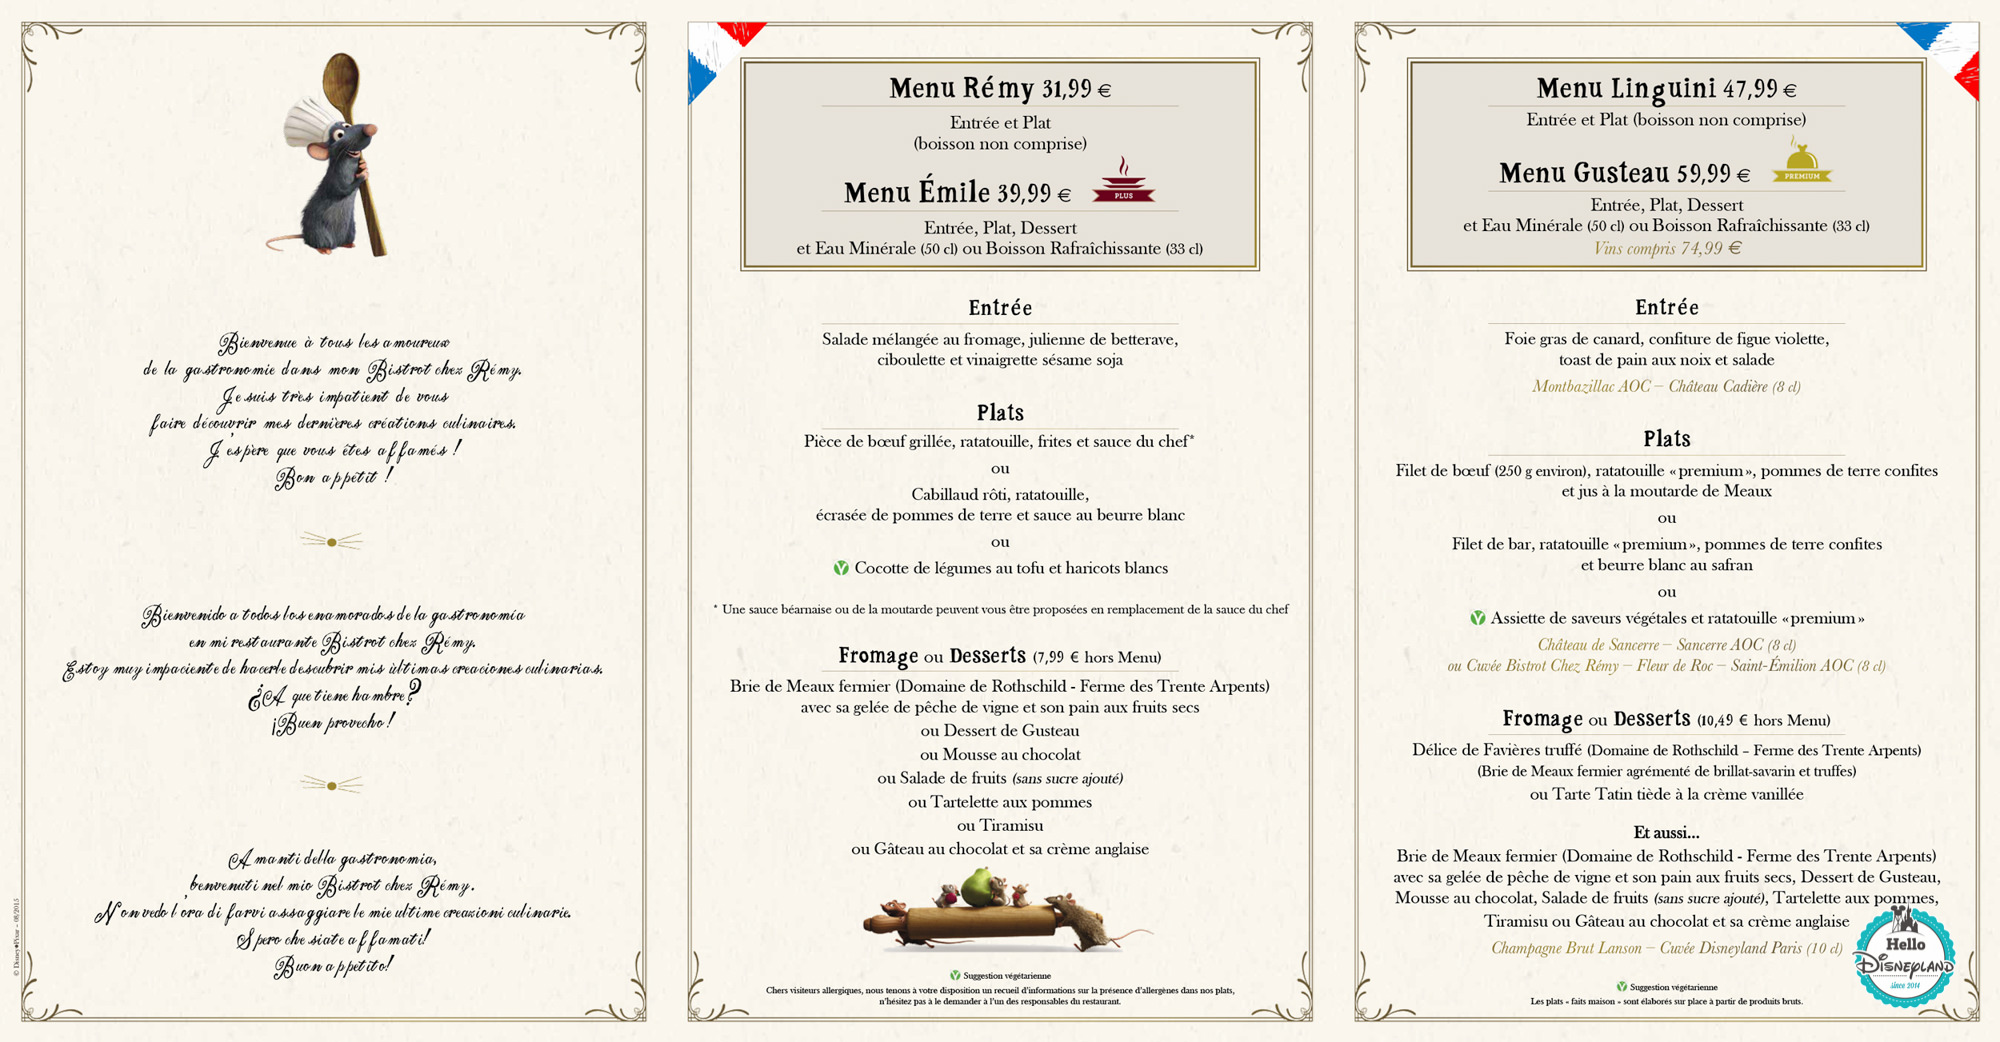 bistrot ratatouille restaurant menu 2015 - 2016